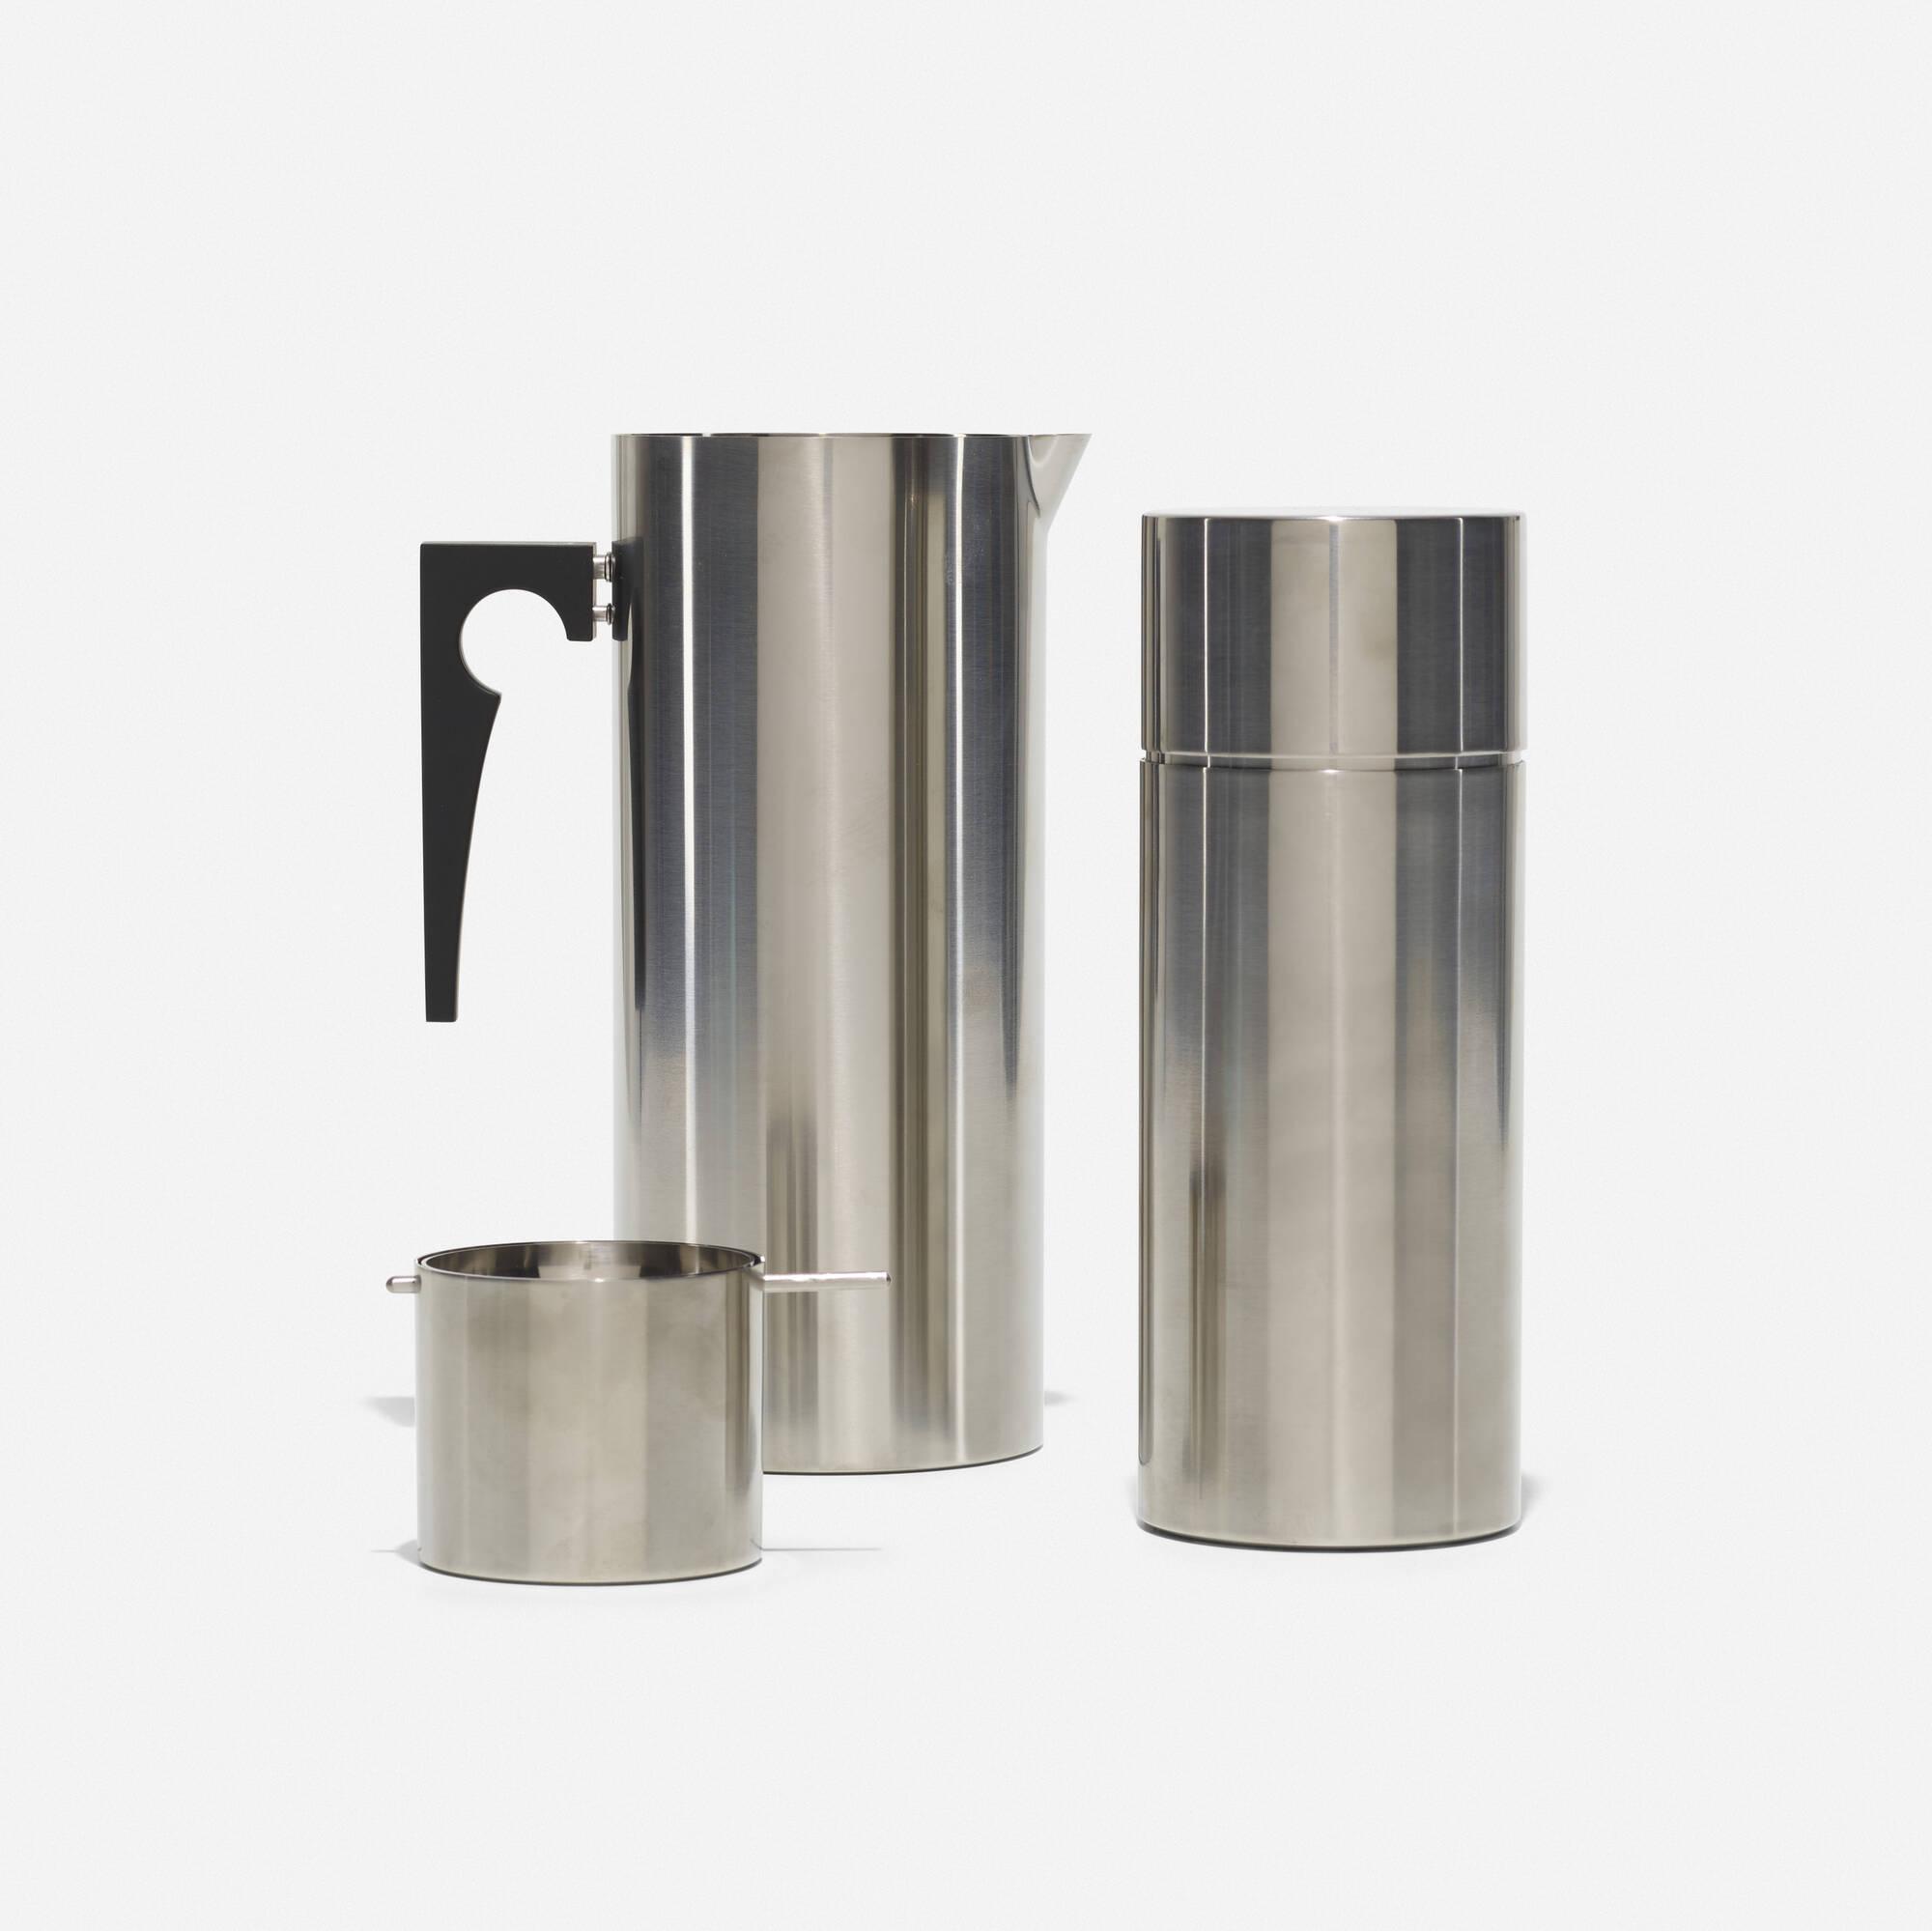 475: Arne Jacobsen / Cylinda bar service (1 of 2)